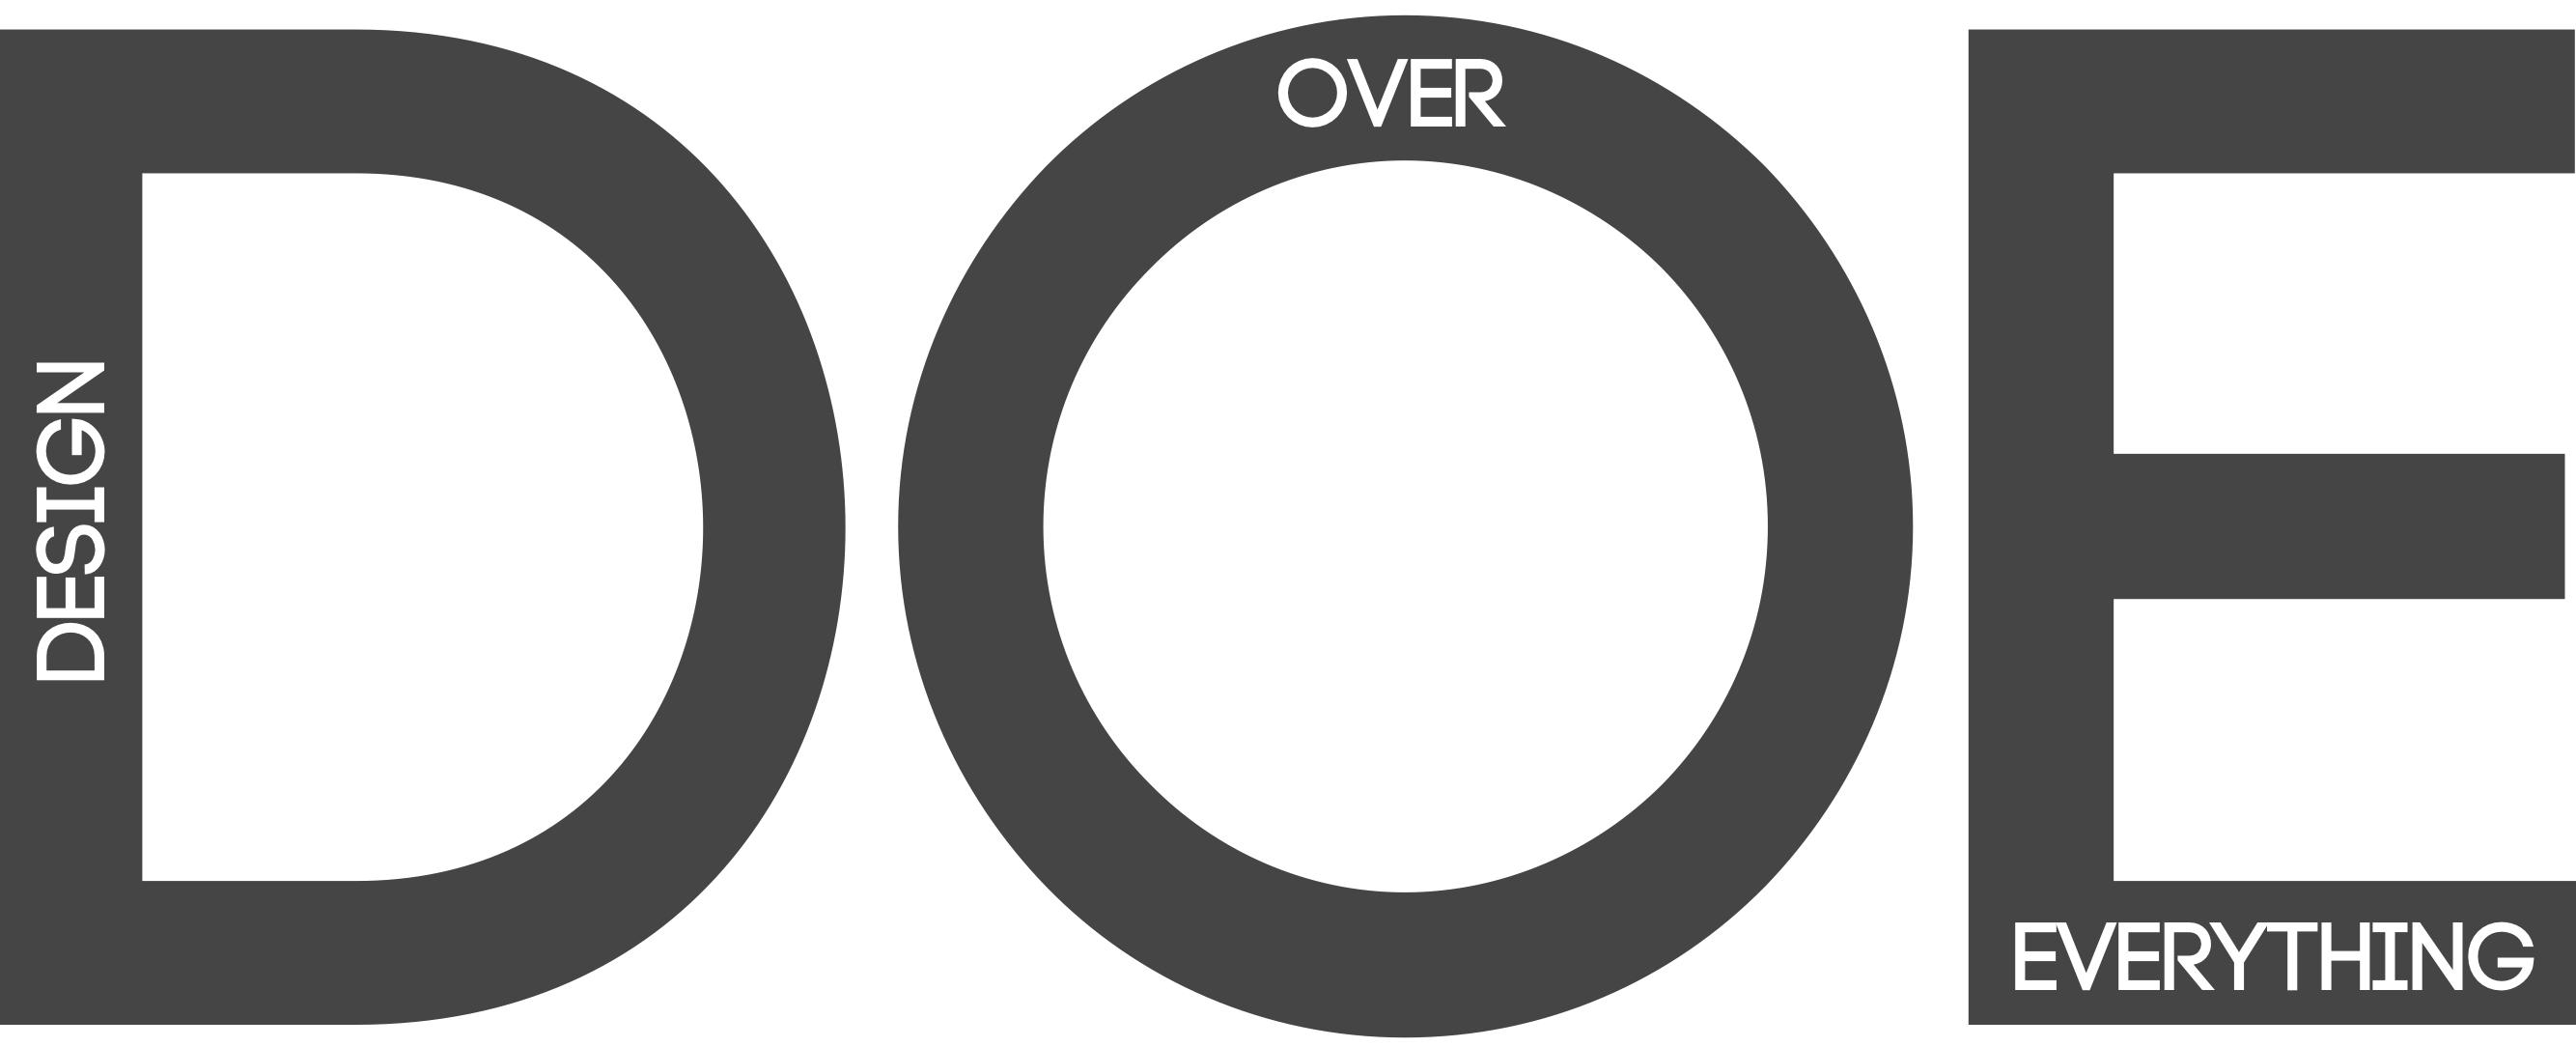 DOE - Design Over Everything